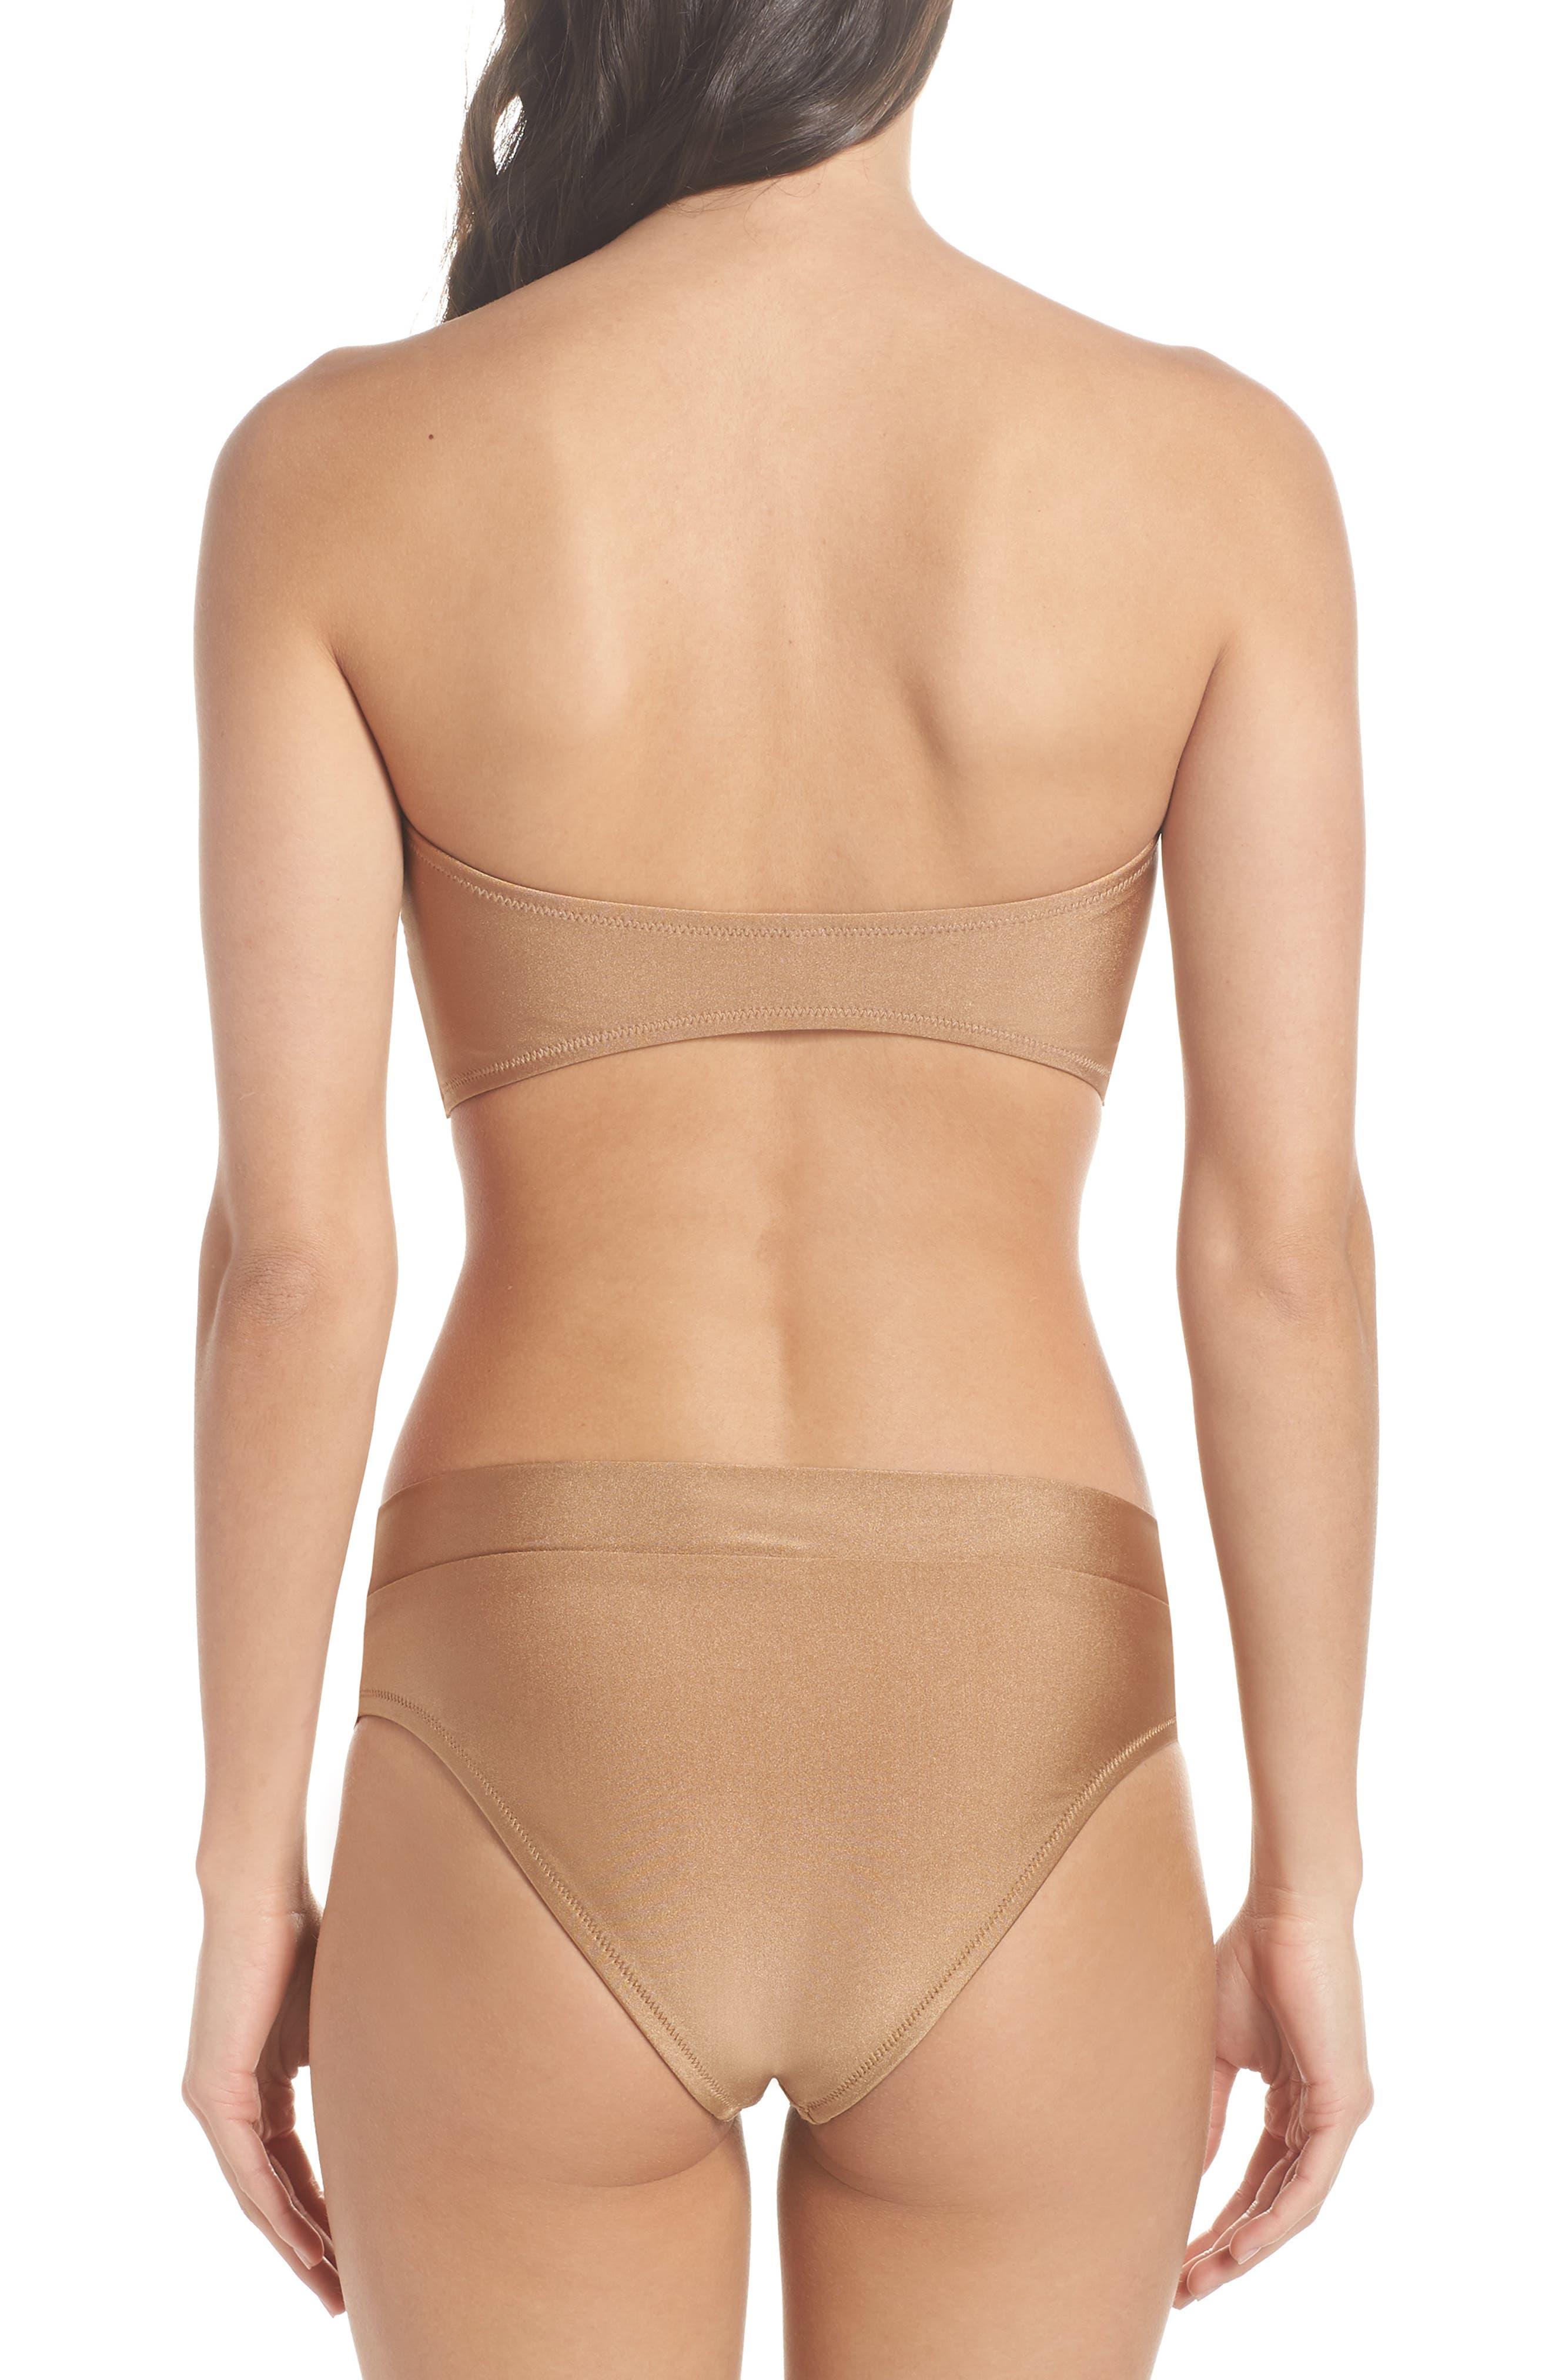 Fairfax Bandeau Bikini Top,                             Alternate thumbnail 8, color,                             710